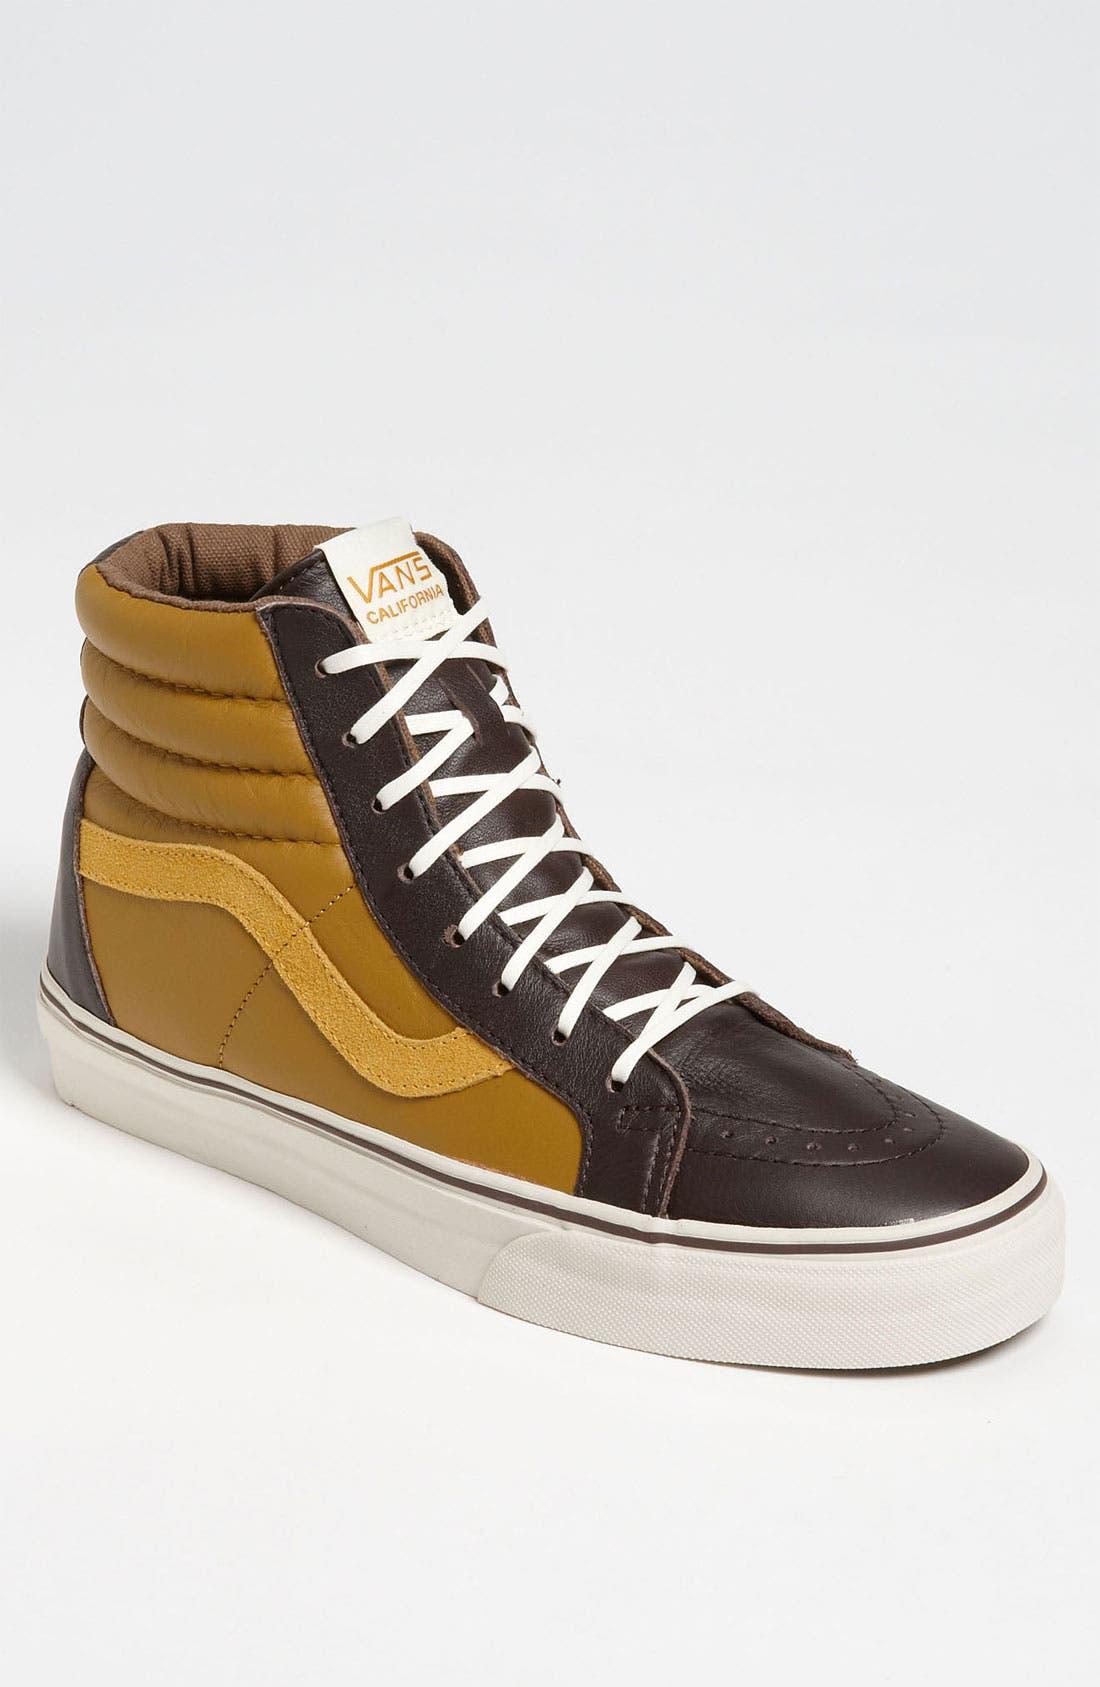 Main Image - Vans 'Sk8-Hi Reissue CA' Sneaker (Men)